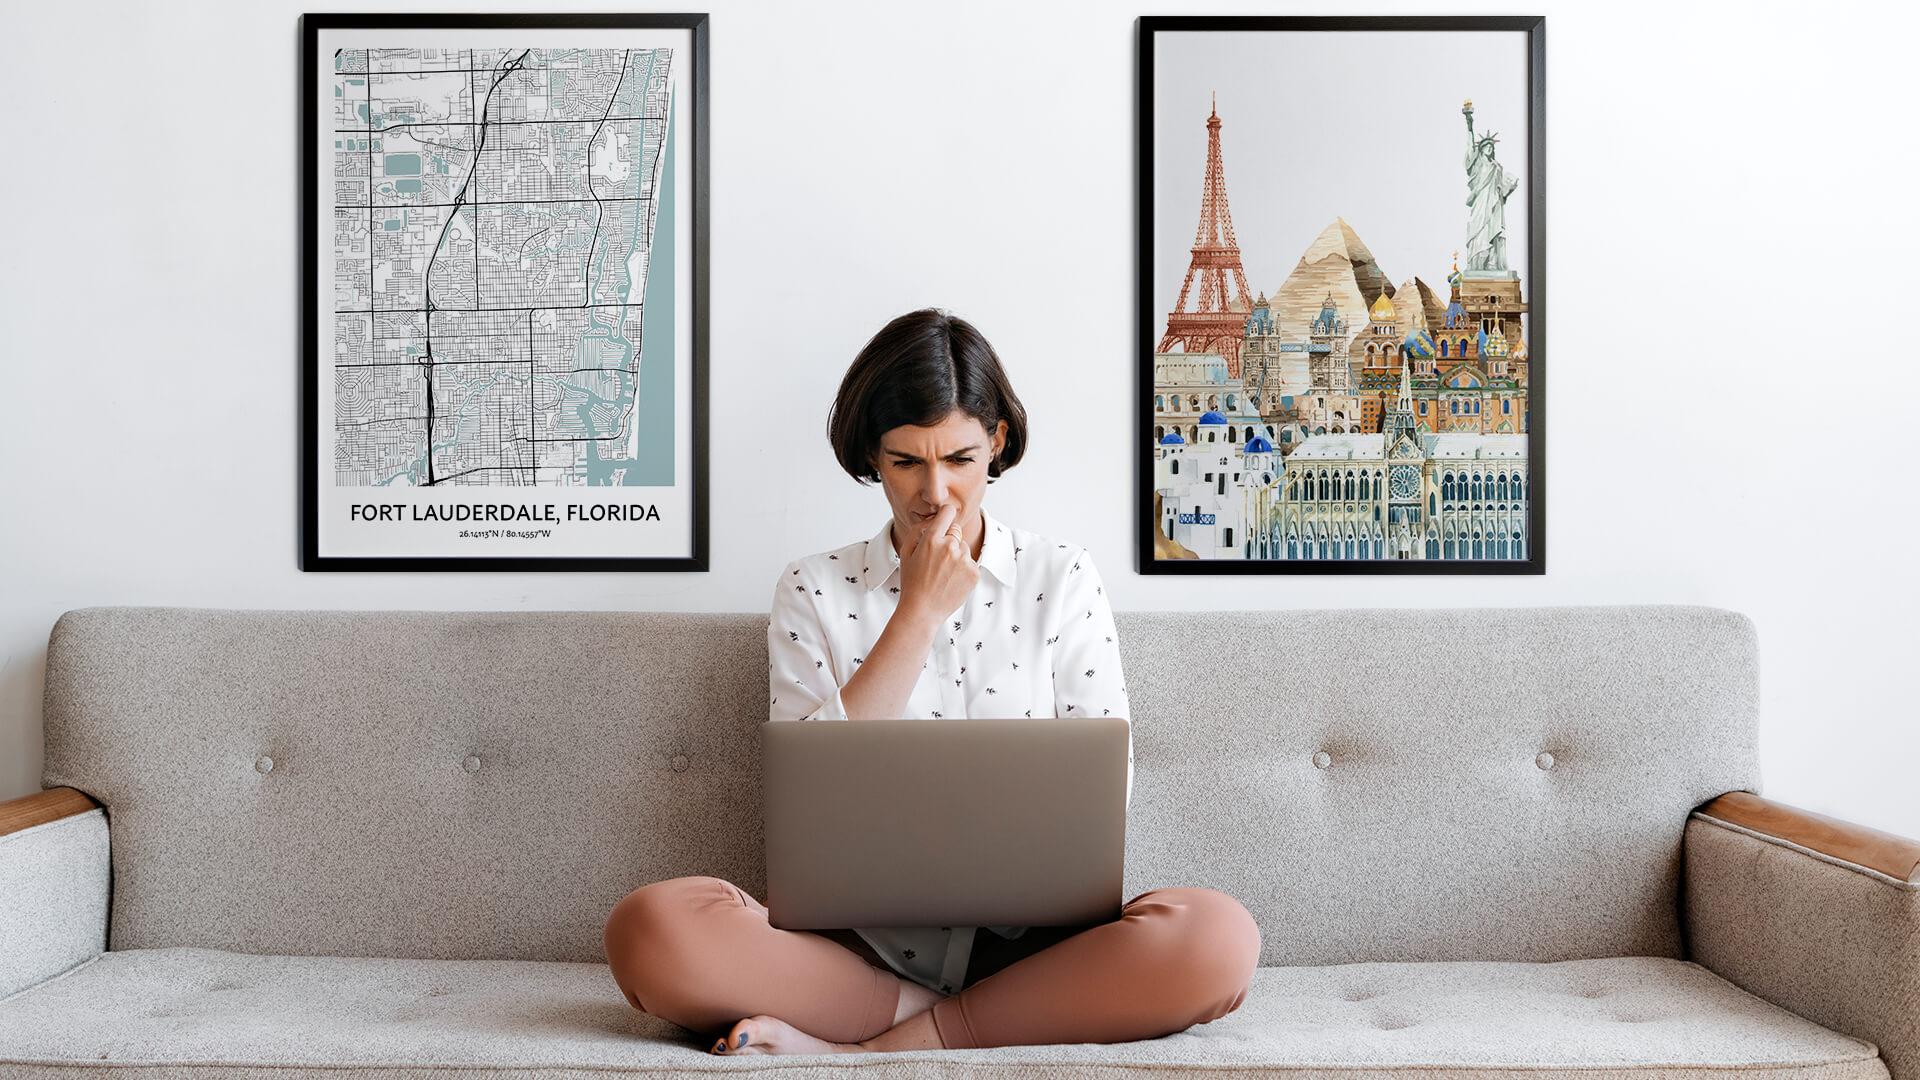 Fort Lauderdale city map art